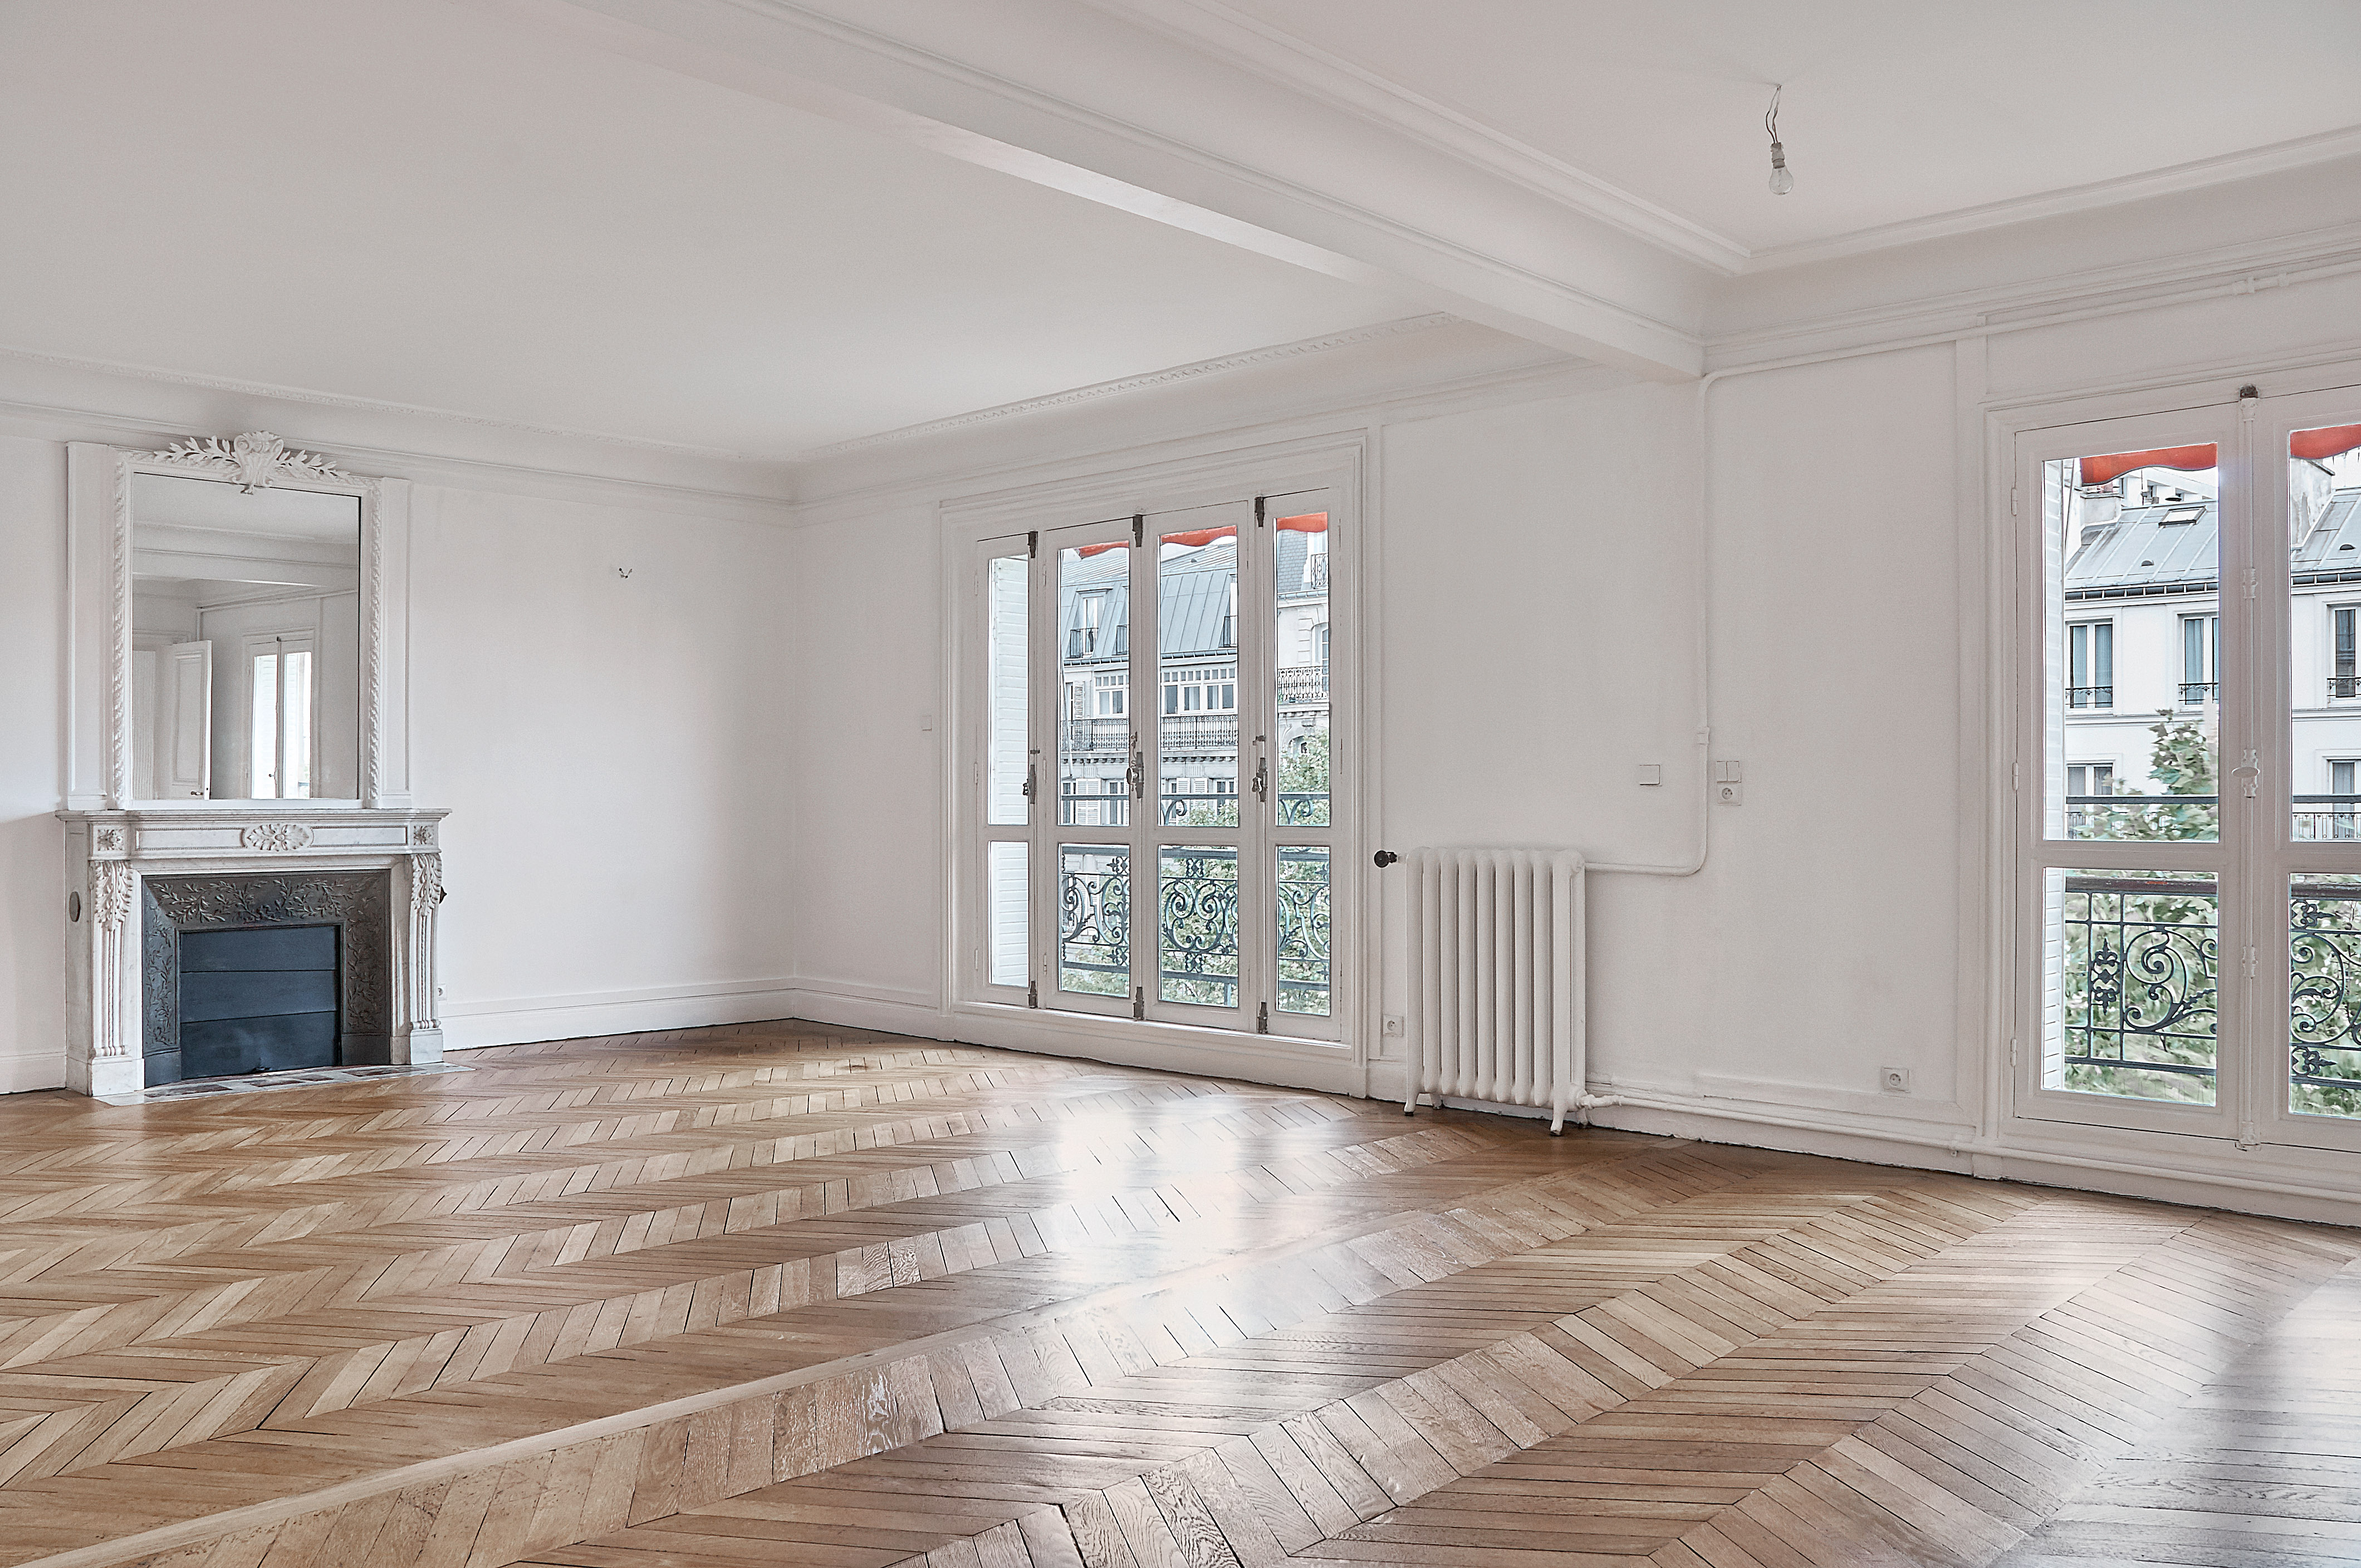 Apartamento para Venda às Apartement - Place des Ternes Paris, Paris 75017 França